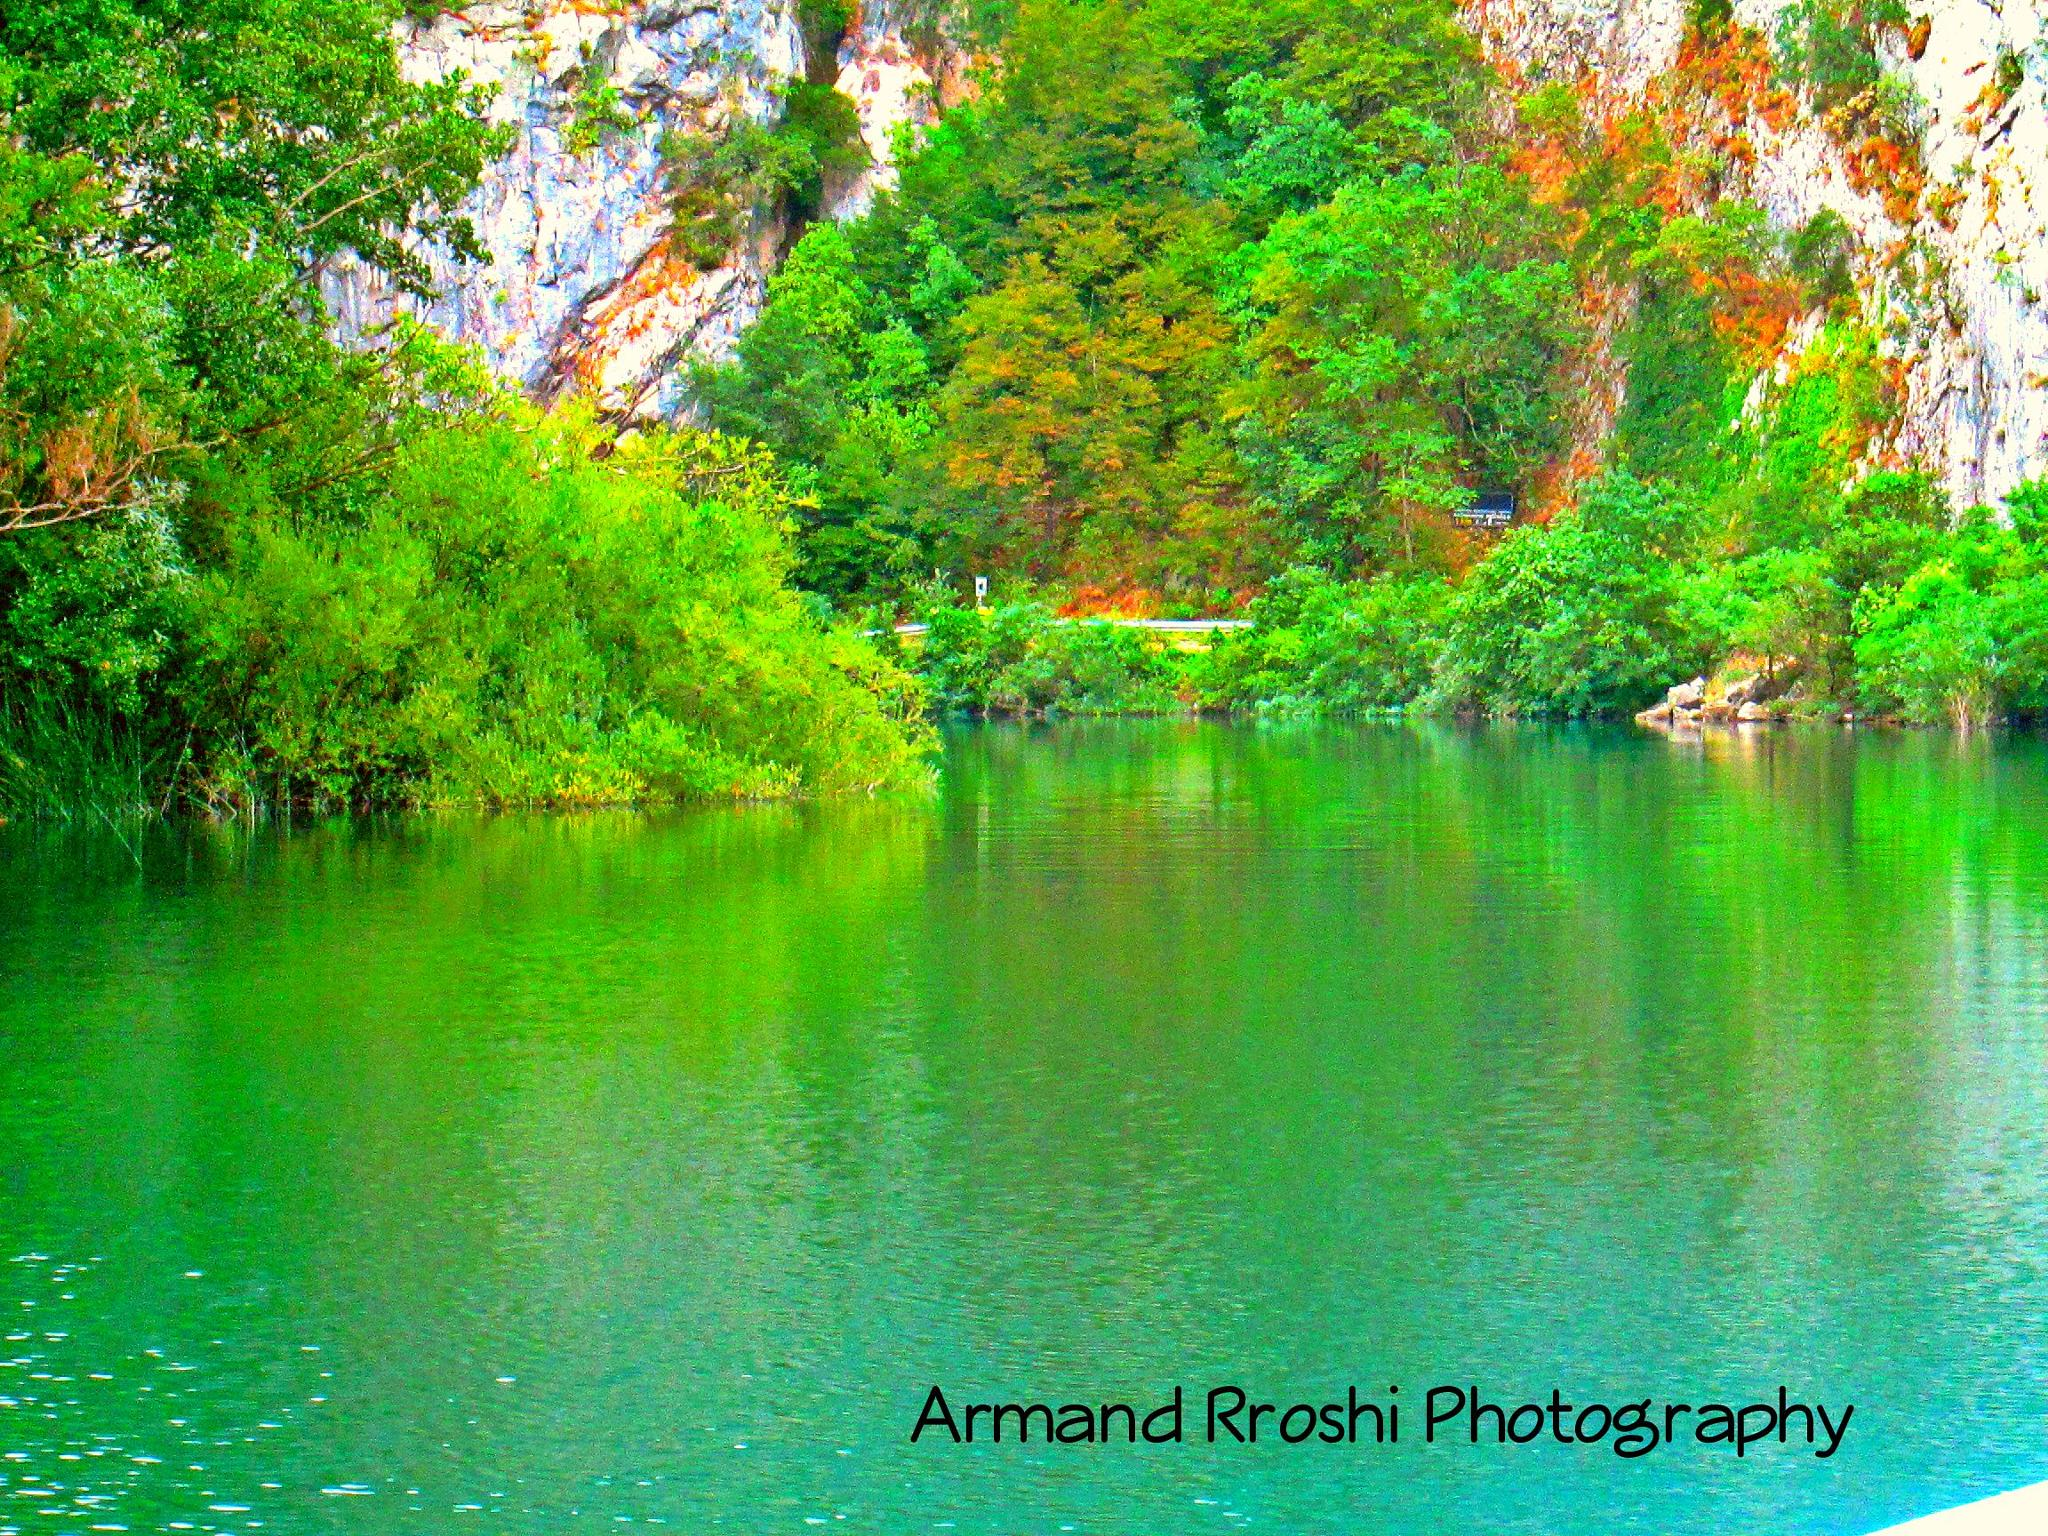 The Cetina River, Omis, Croatia  by Armand Rroshi